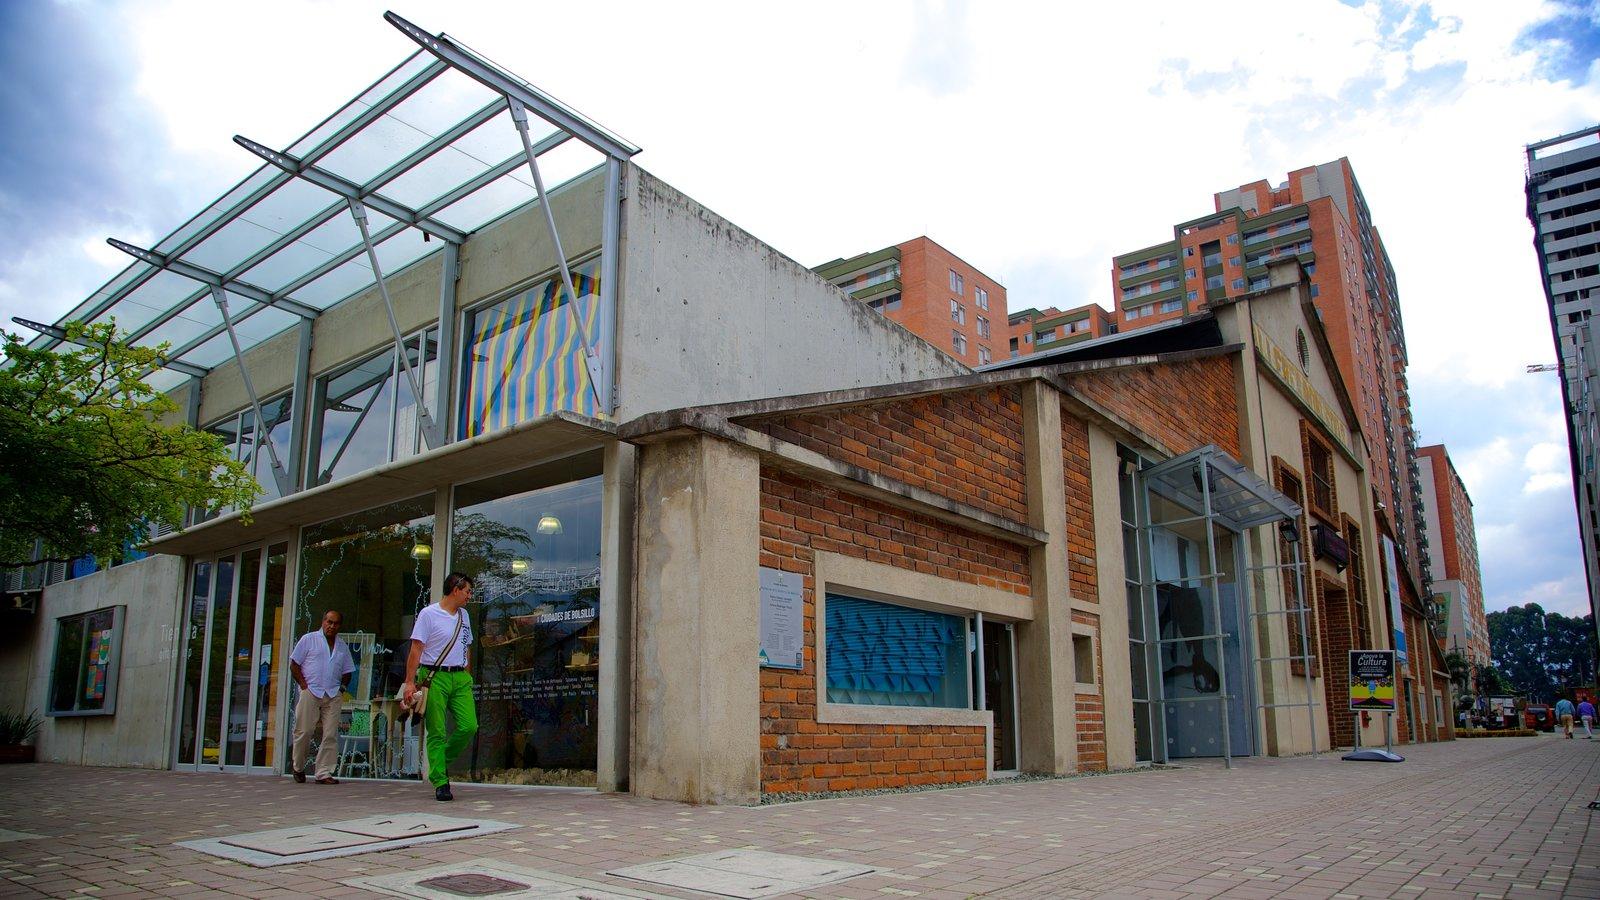 Museo de Arte Moderno de Medellín que inclui cenas de rua e elementos de patrimônio